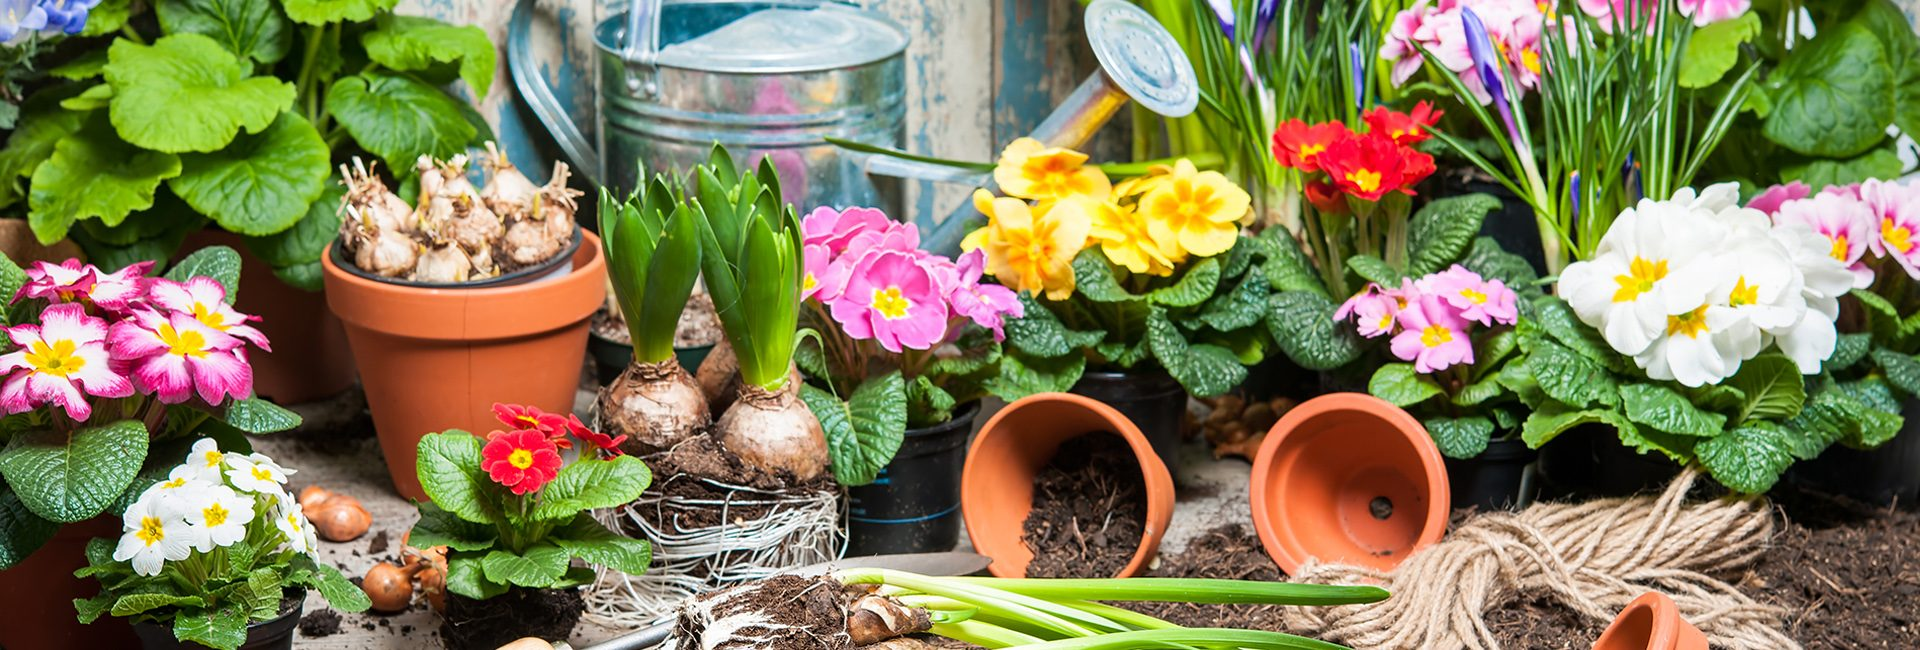 Frühlingszwiebeln in Parsberg kaufen